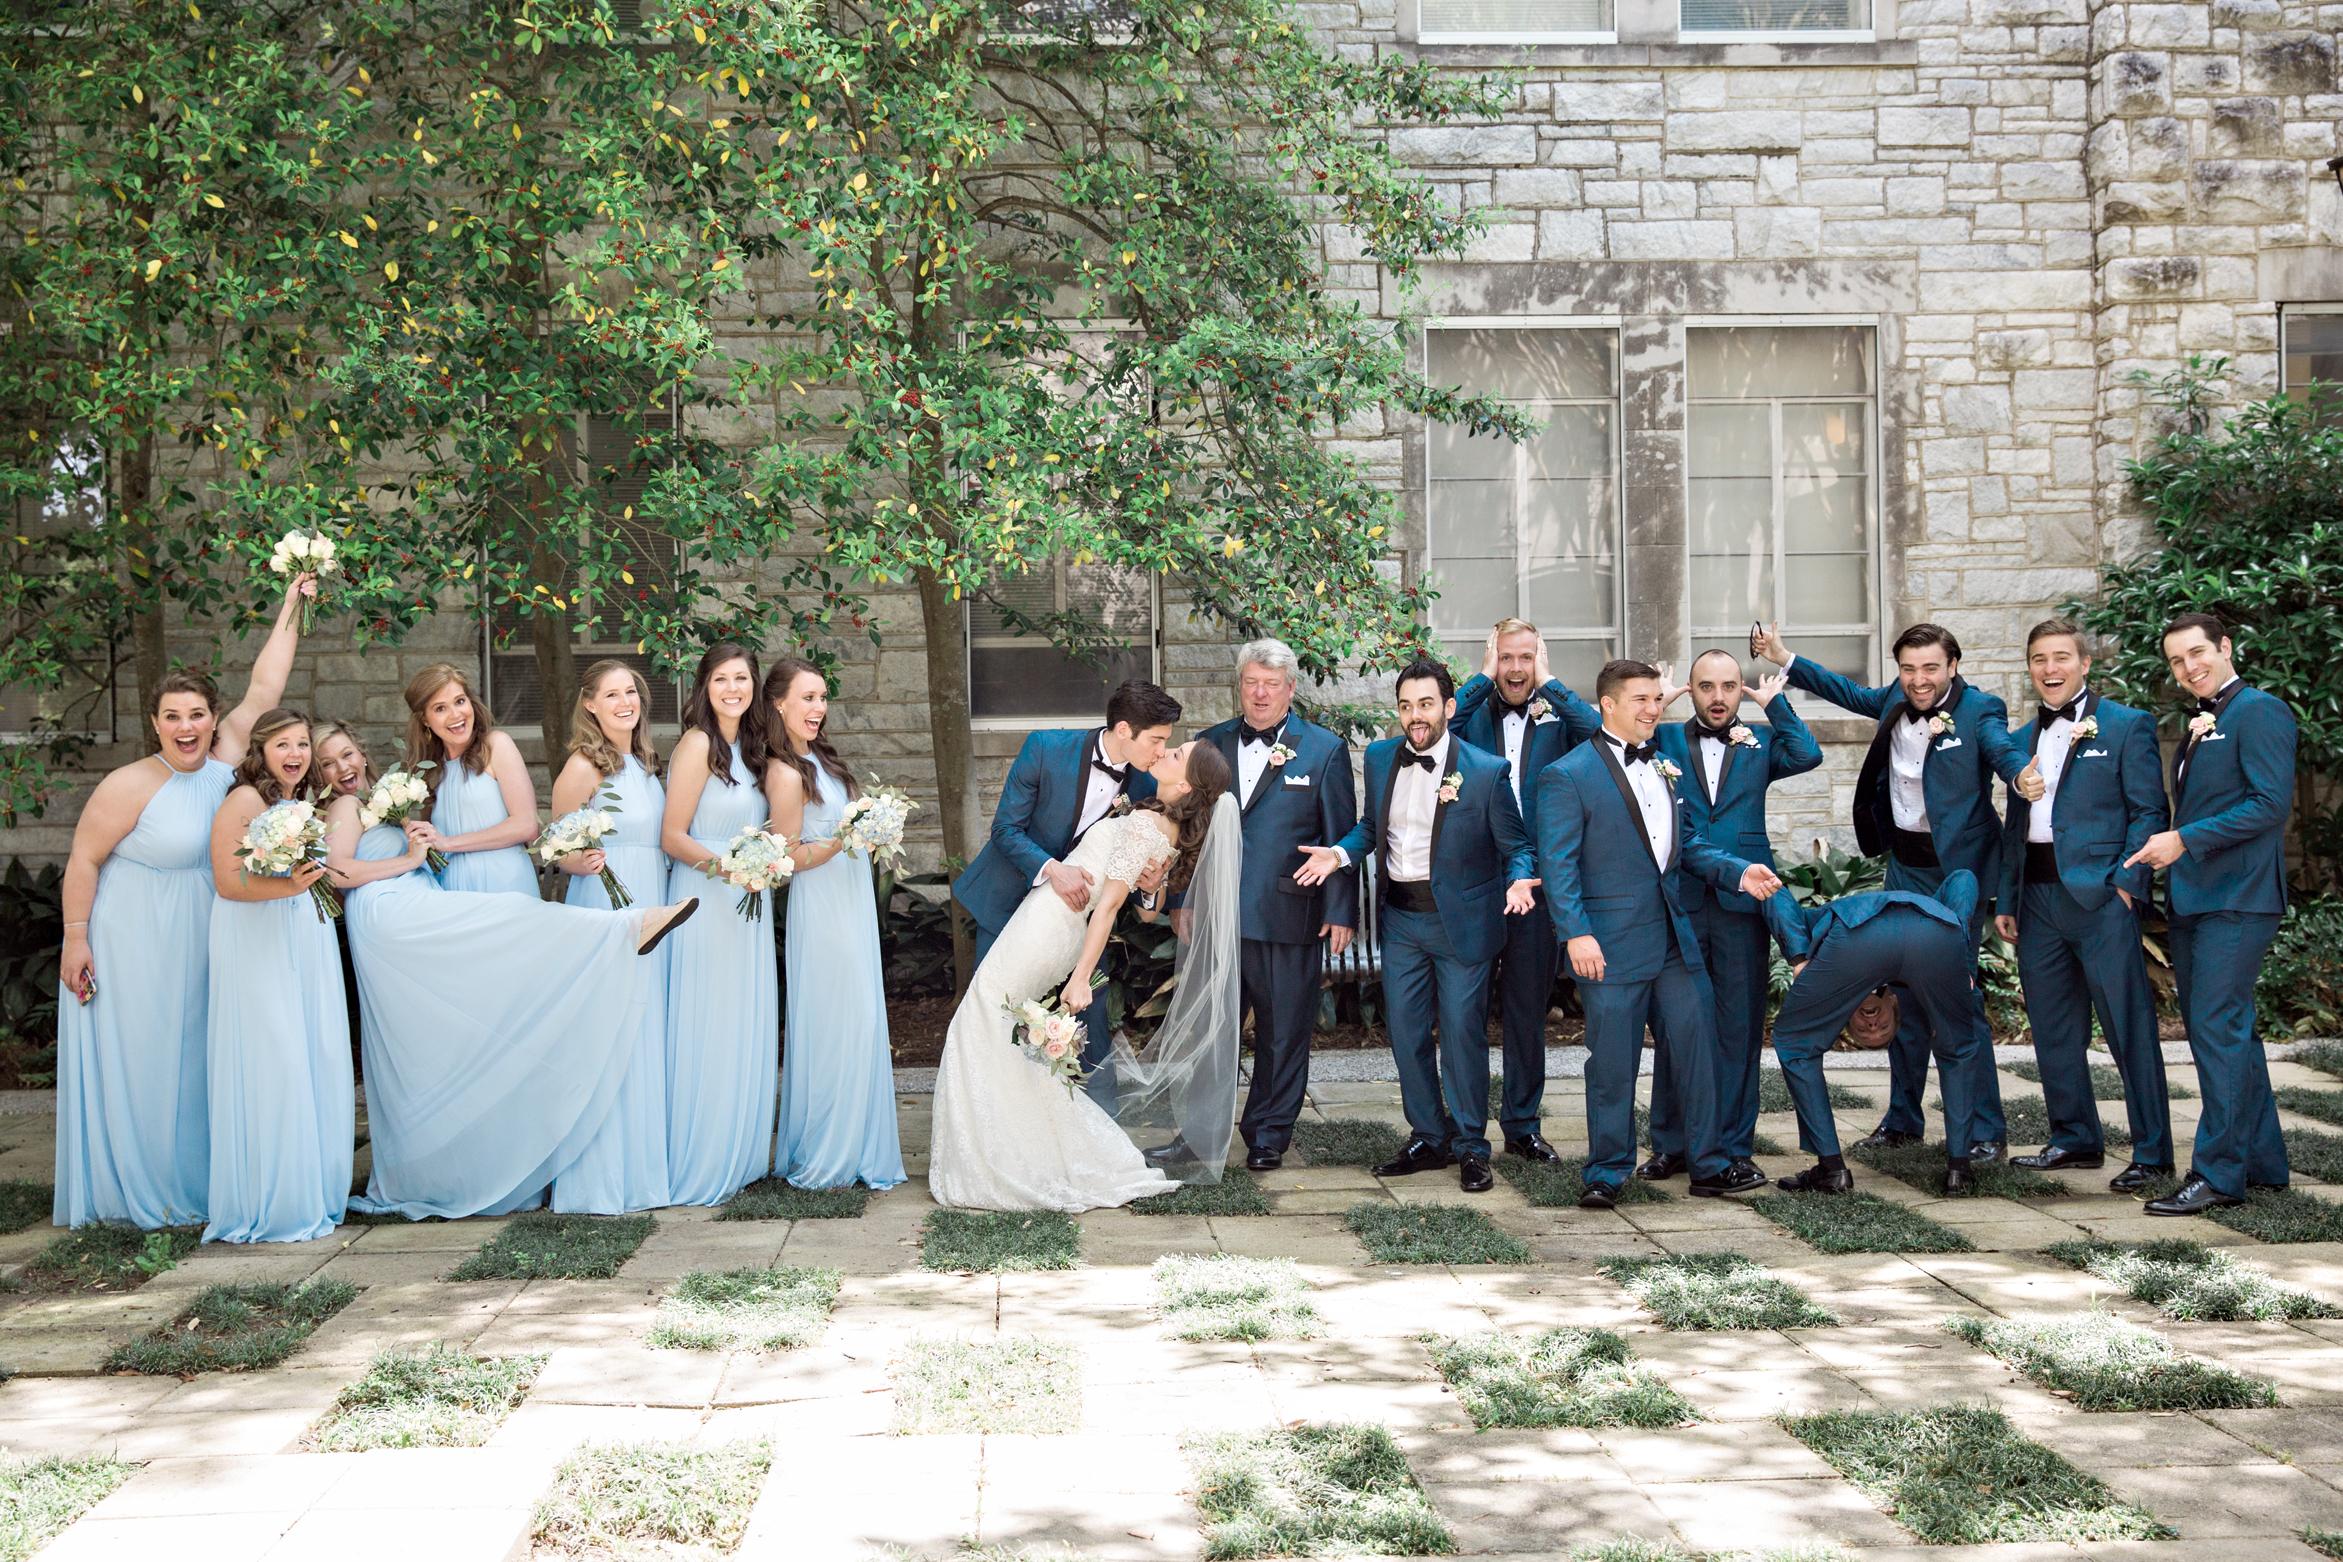 Ni ck-Drollette-Photography-Montgomery-Alabama-Weddings-130.jpg